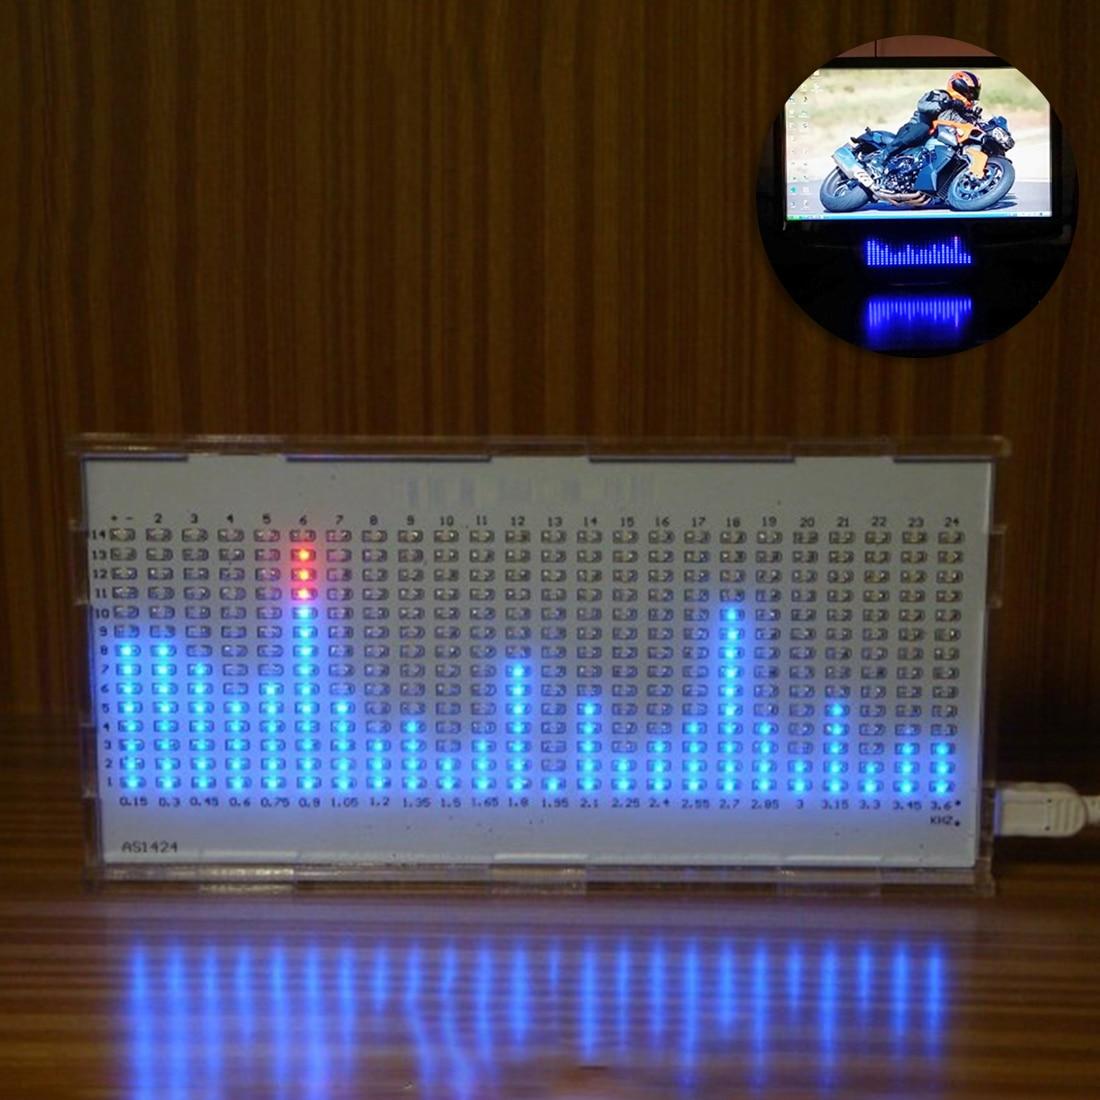 DIY Light Cube Kit AS1424 Music Spectrum LED Display Audio Amplifier Modification Rhythm Lamp For Child - Bulk Parts White/Black